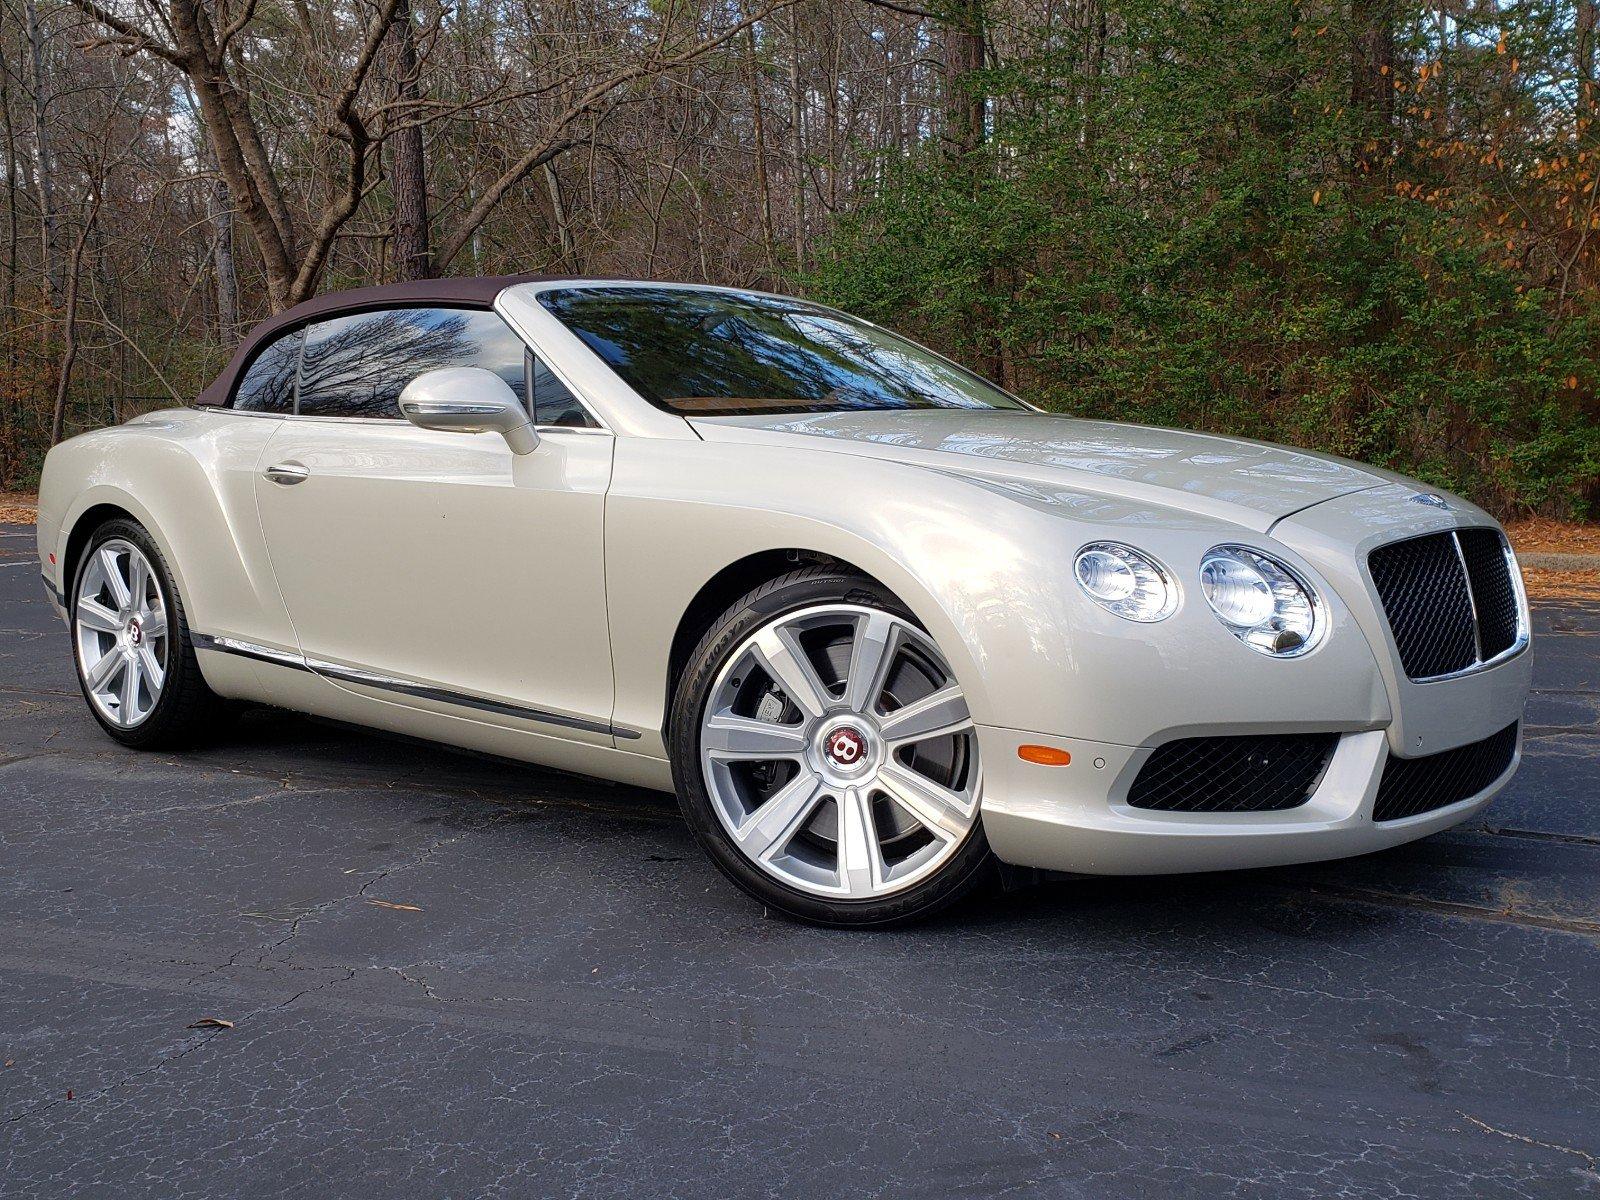 2013 Bentley Continental GT V8 Convertible image